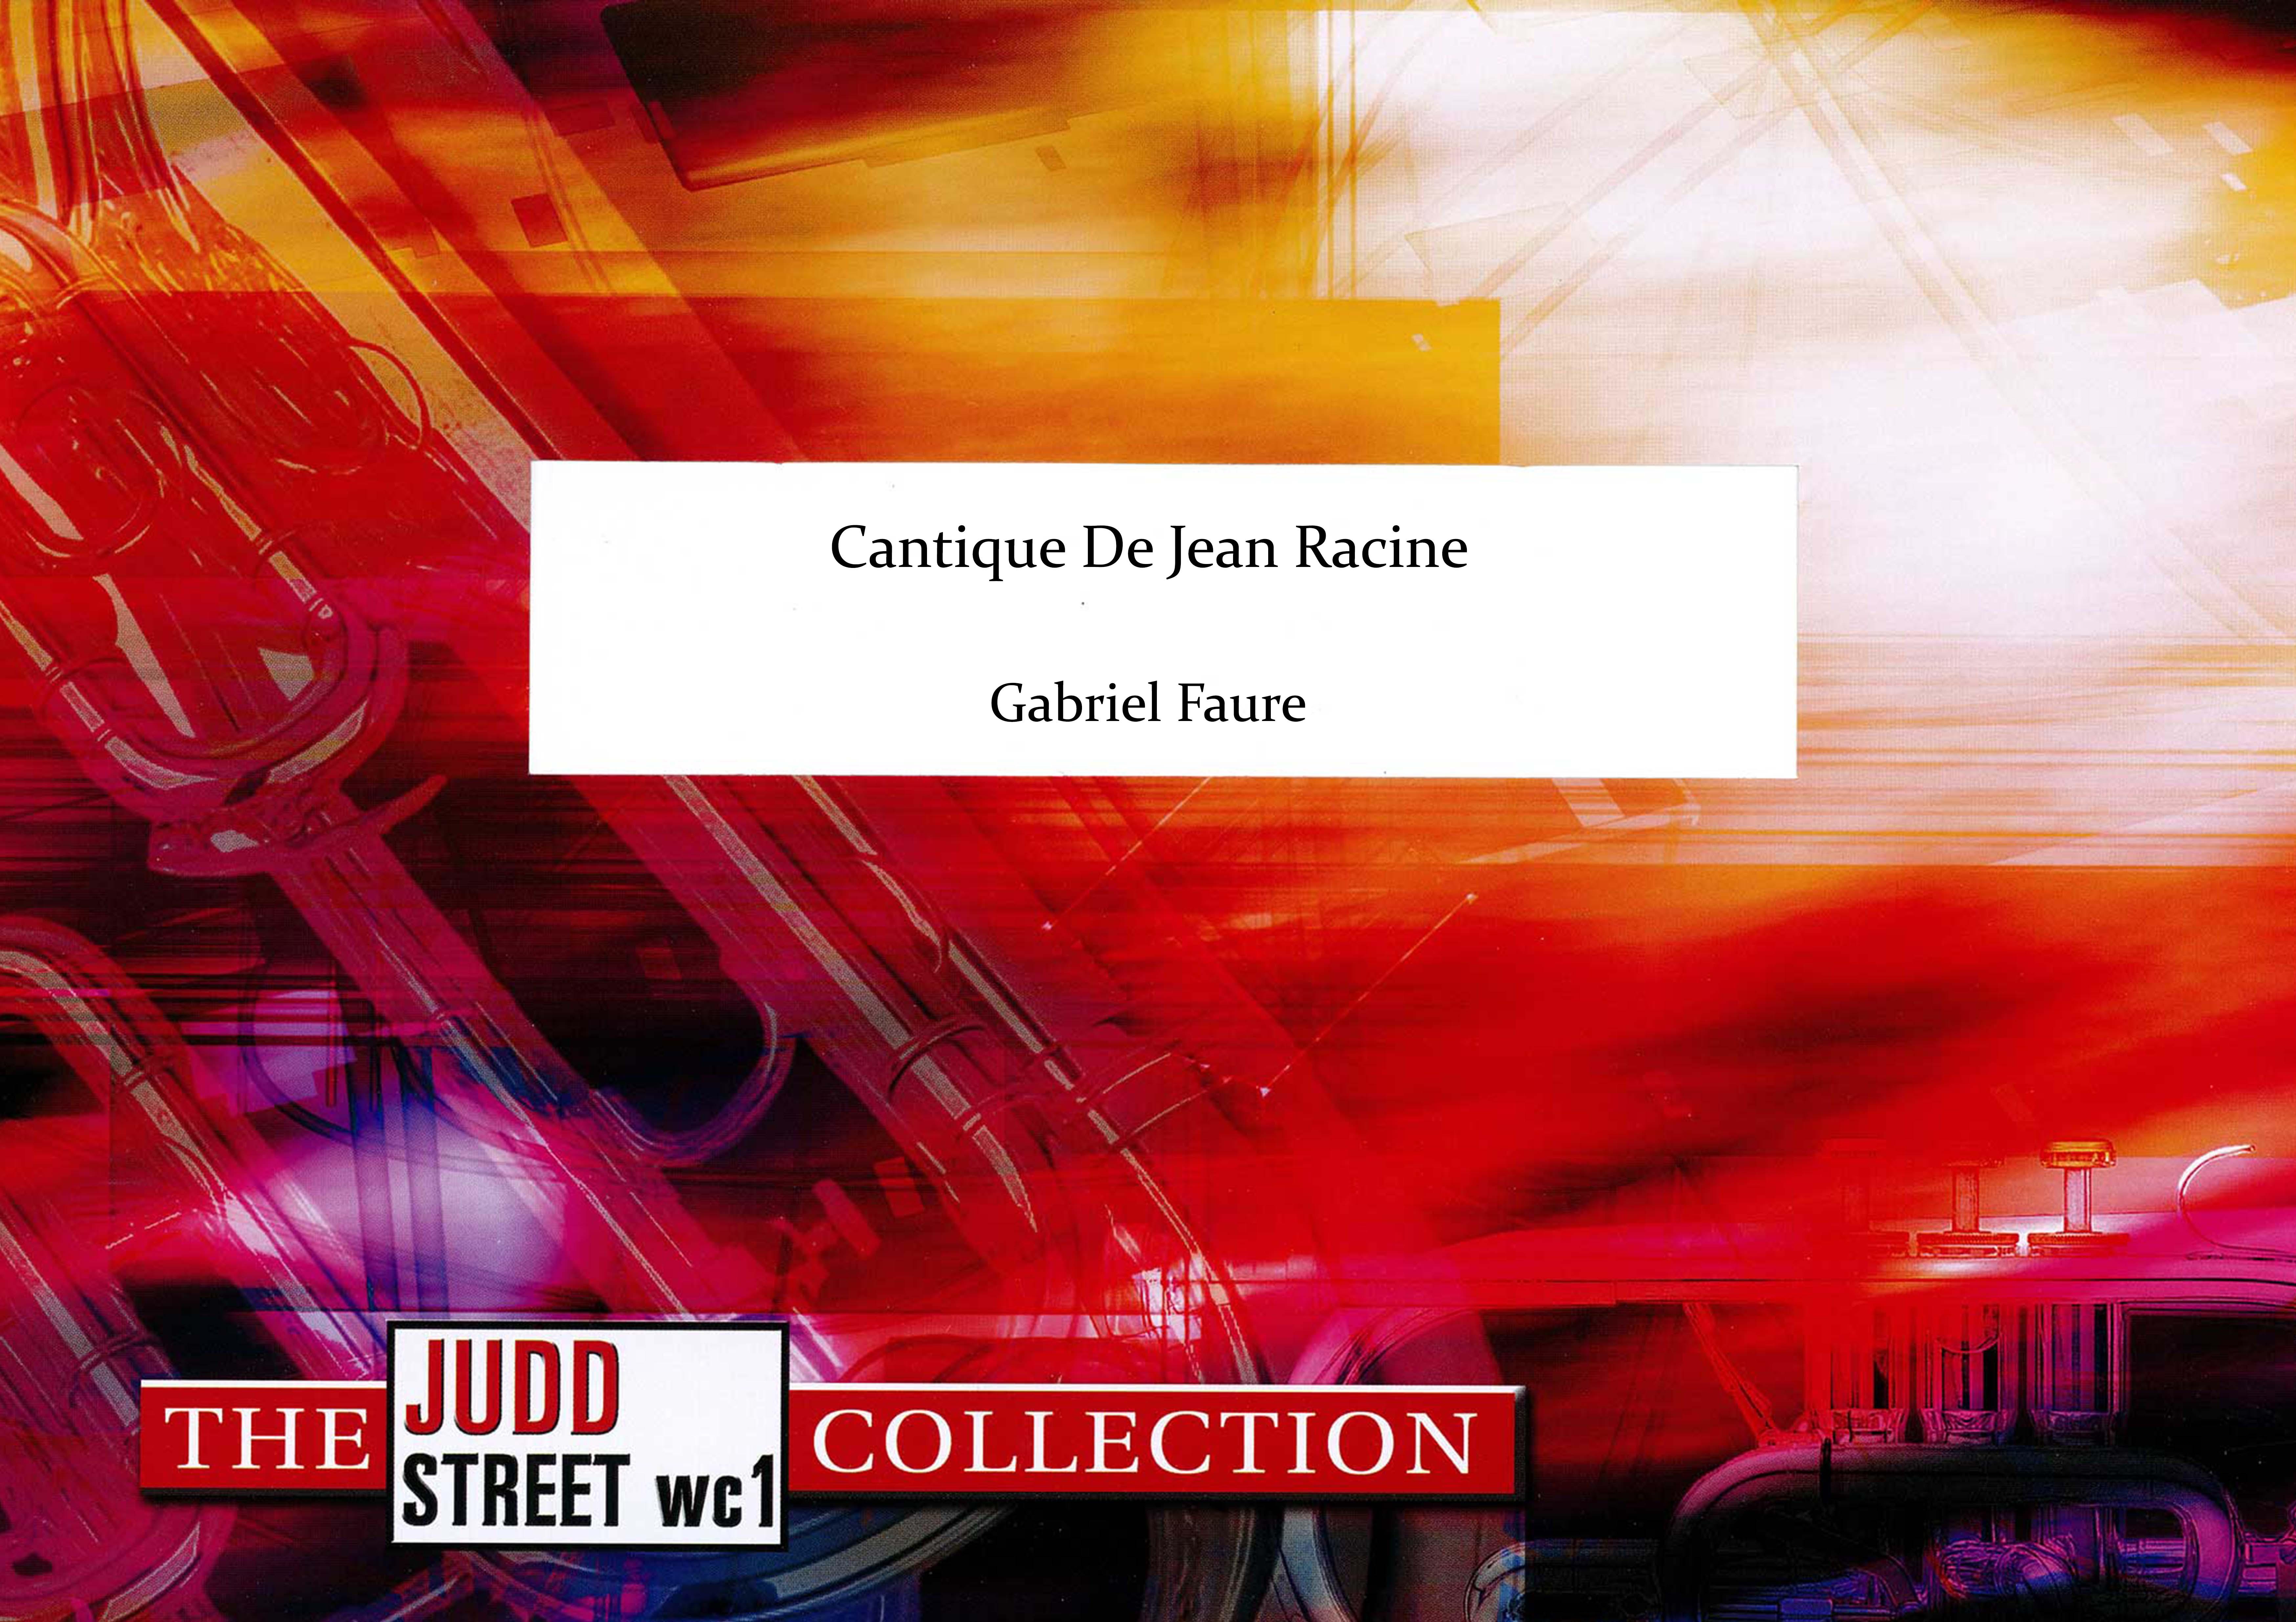 Cantique De Jean Racine (Brass Band - Score only)